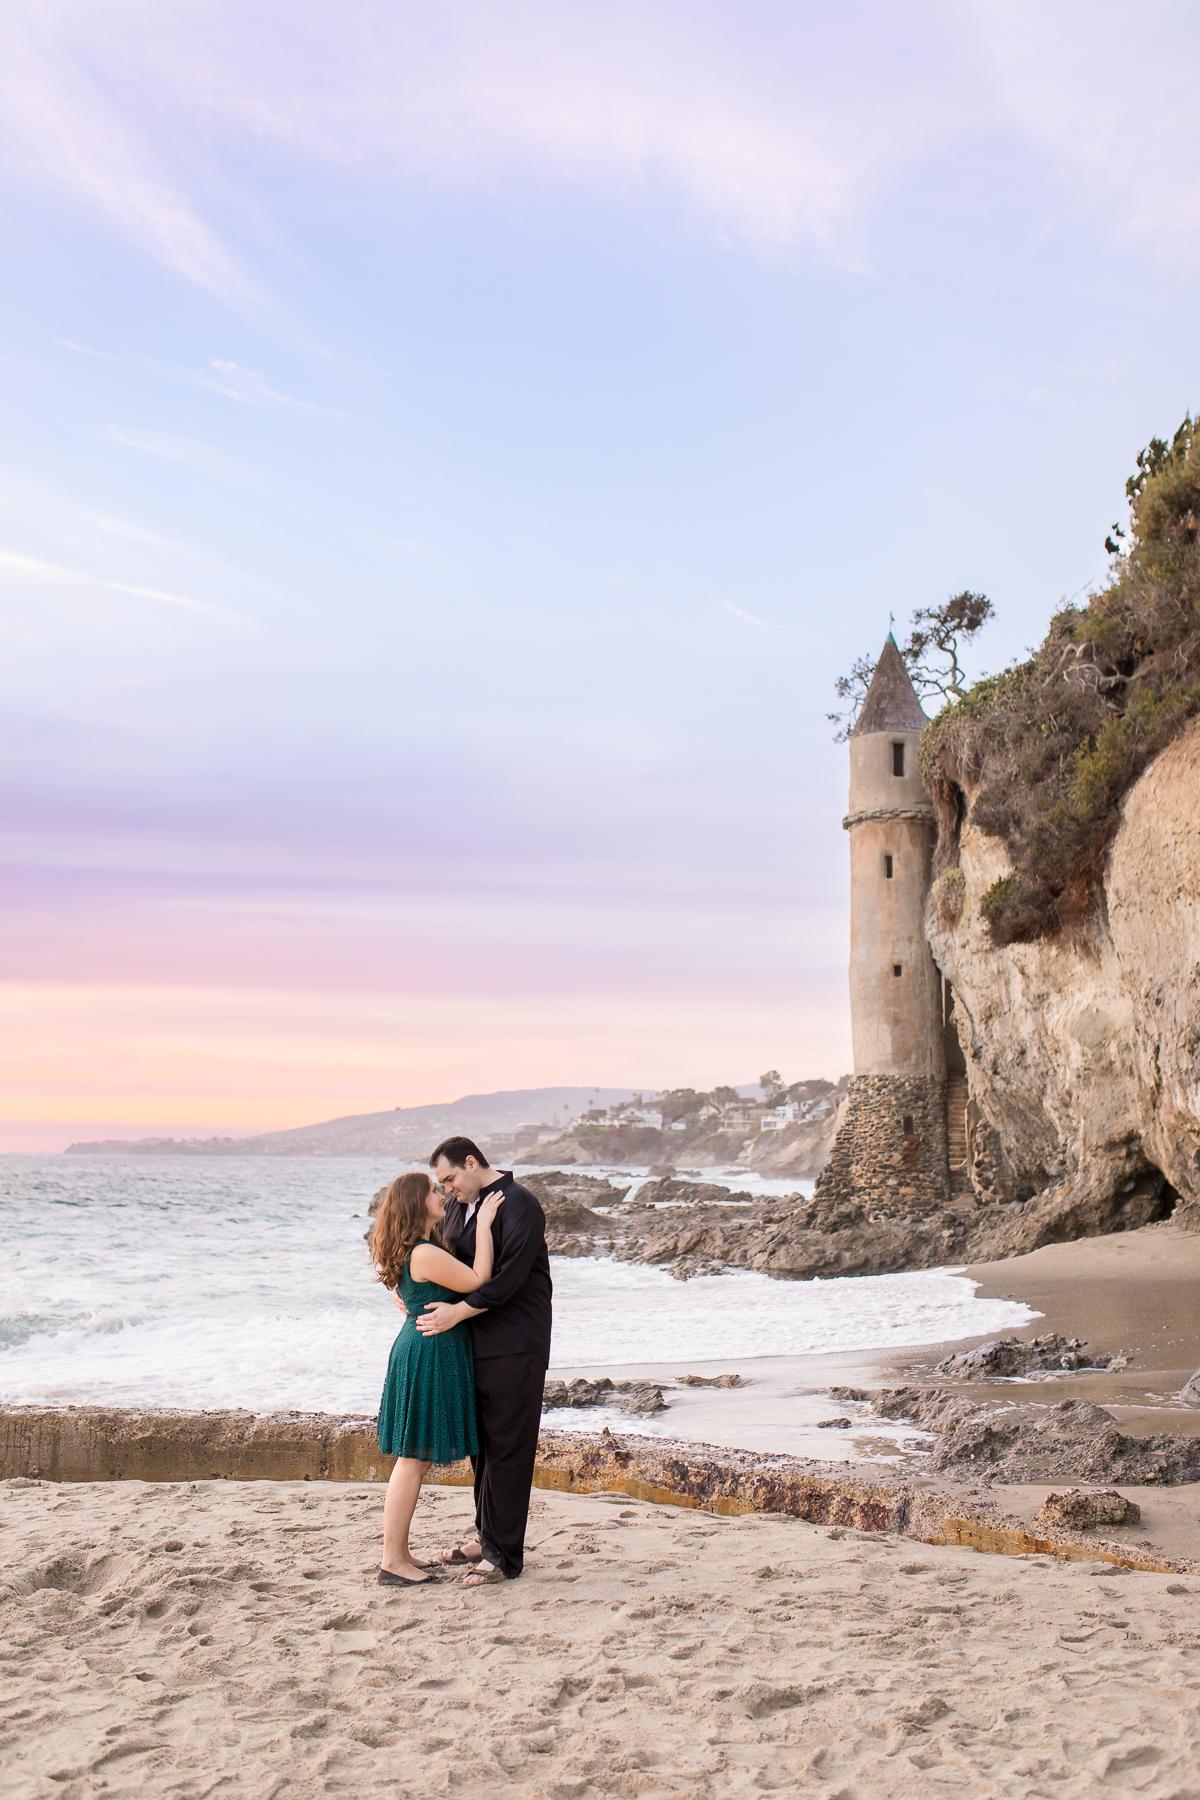 Beach Destination engagement session by Laramie based photographer, Megan Lee Photography